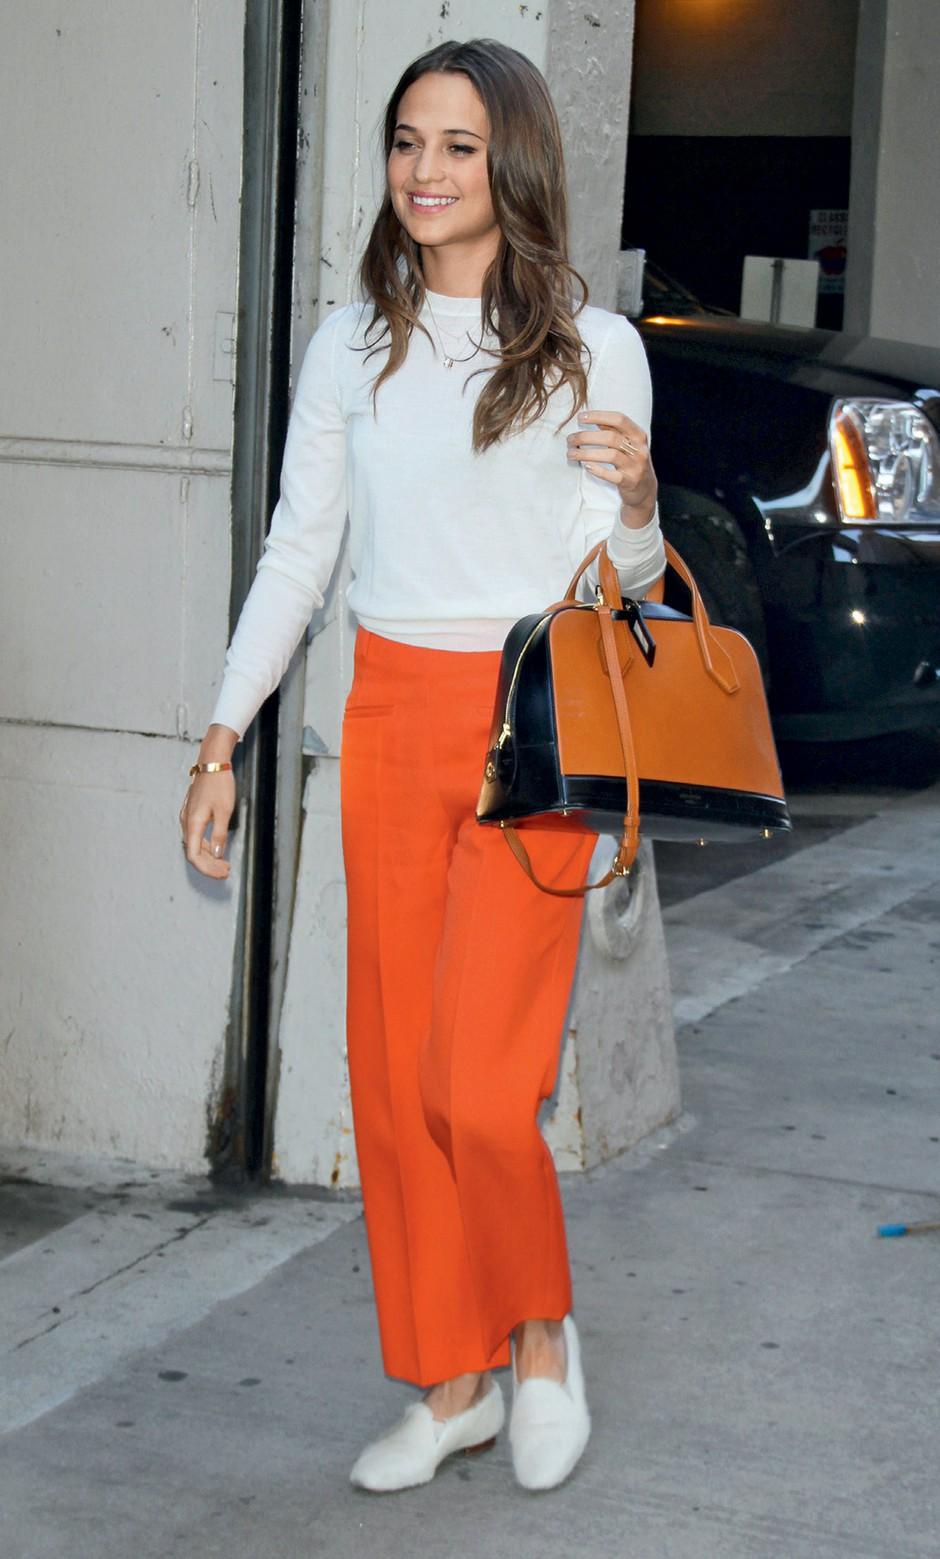 Modni ulov: Alicia Vikander barvito minimalistično (foto: Profimedia)